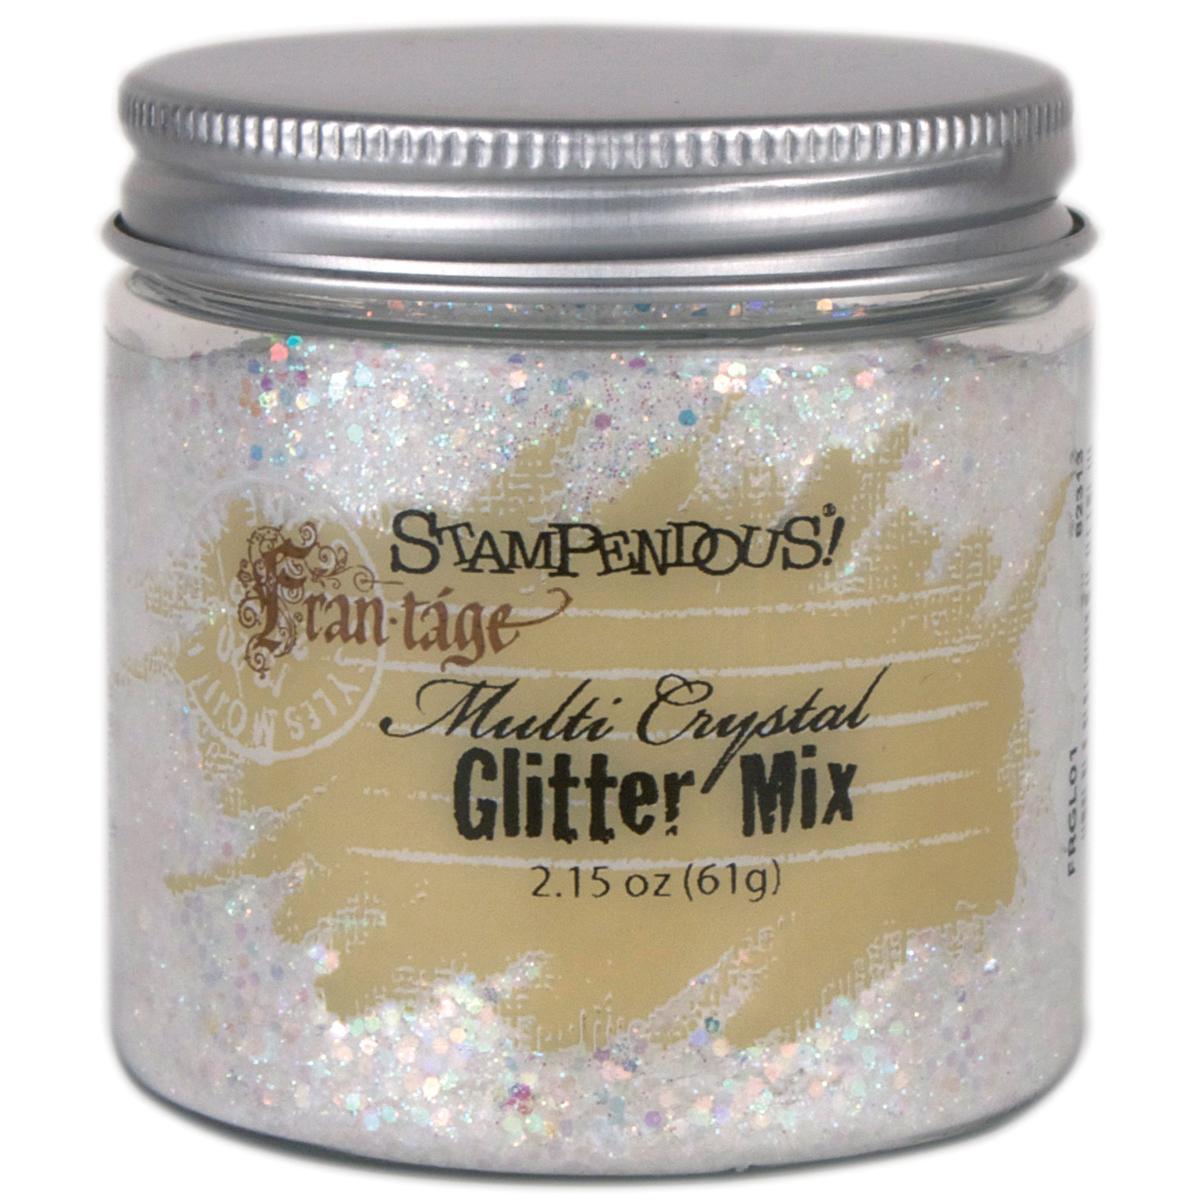 Crystal Glitter Mix